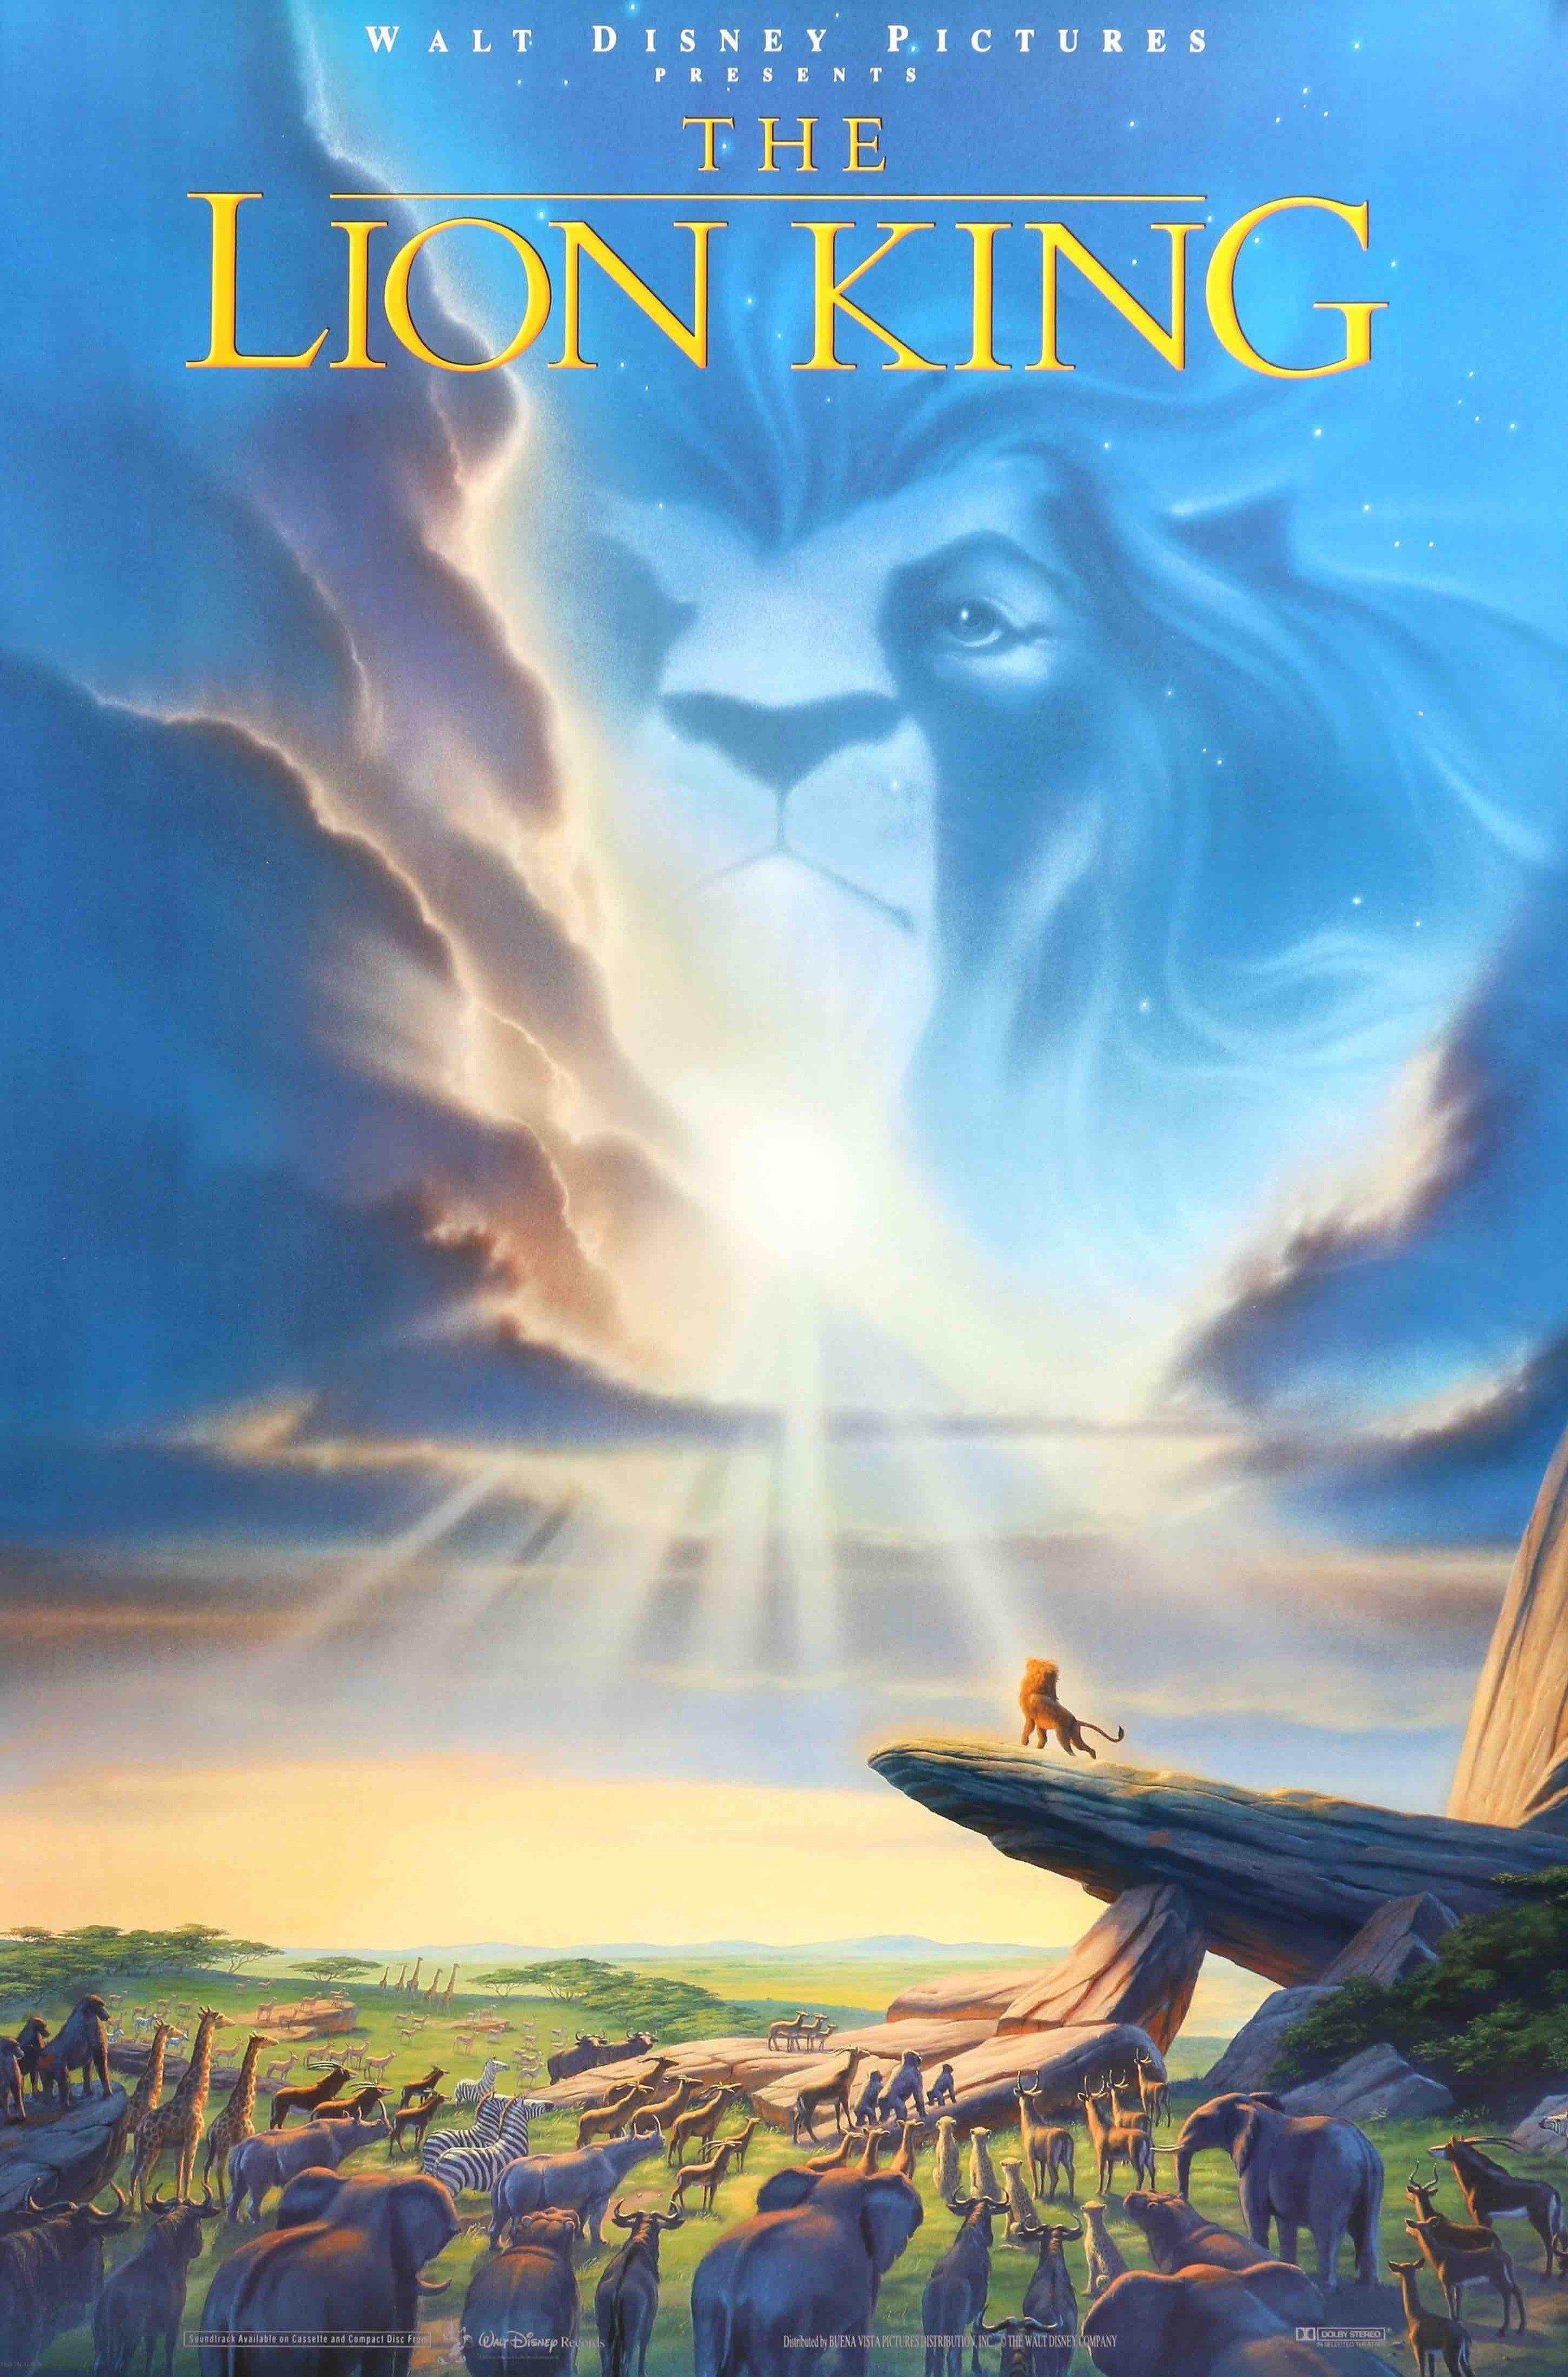 Lion King (1994) | Movies~1990 To 1999 | Walt Disney ...